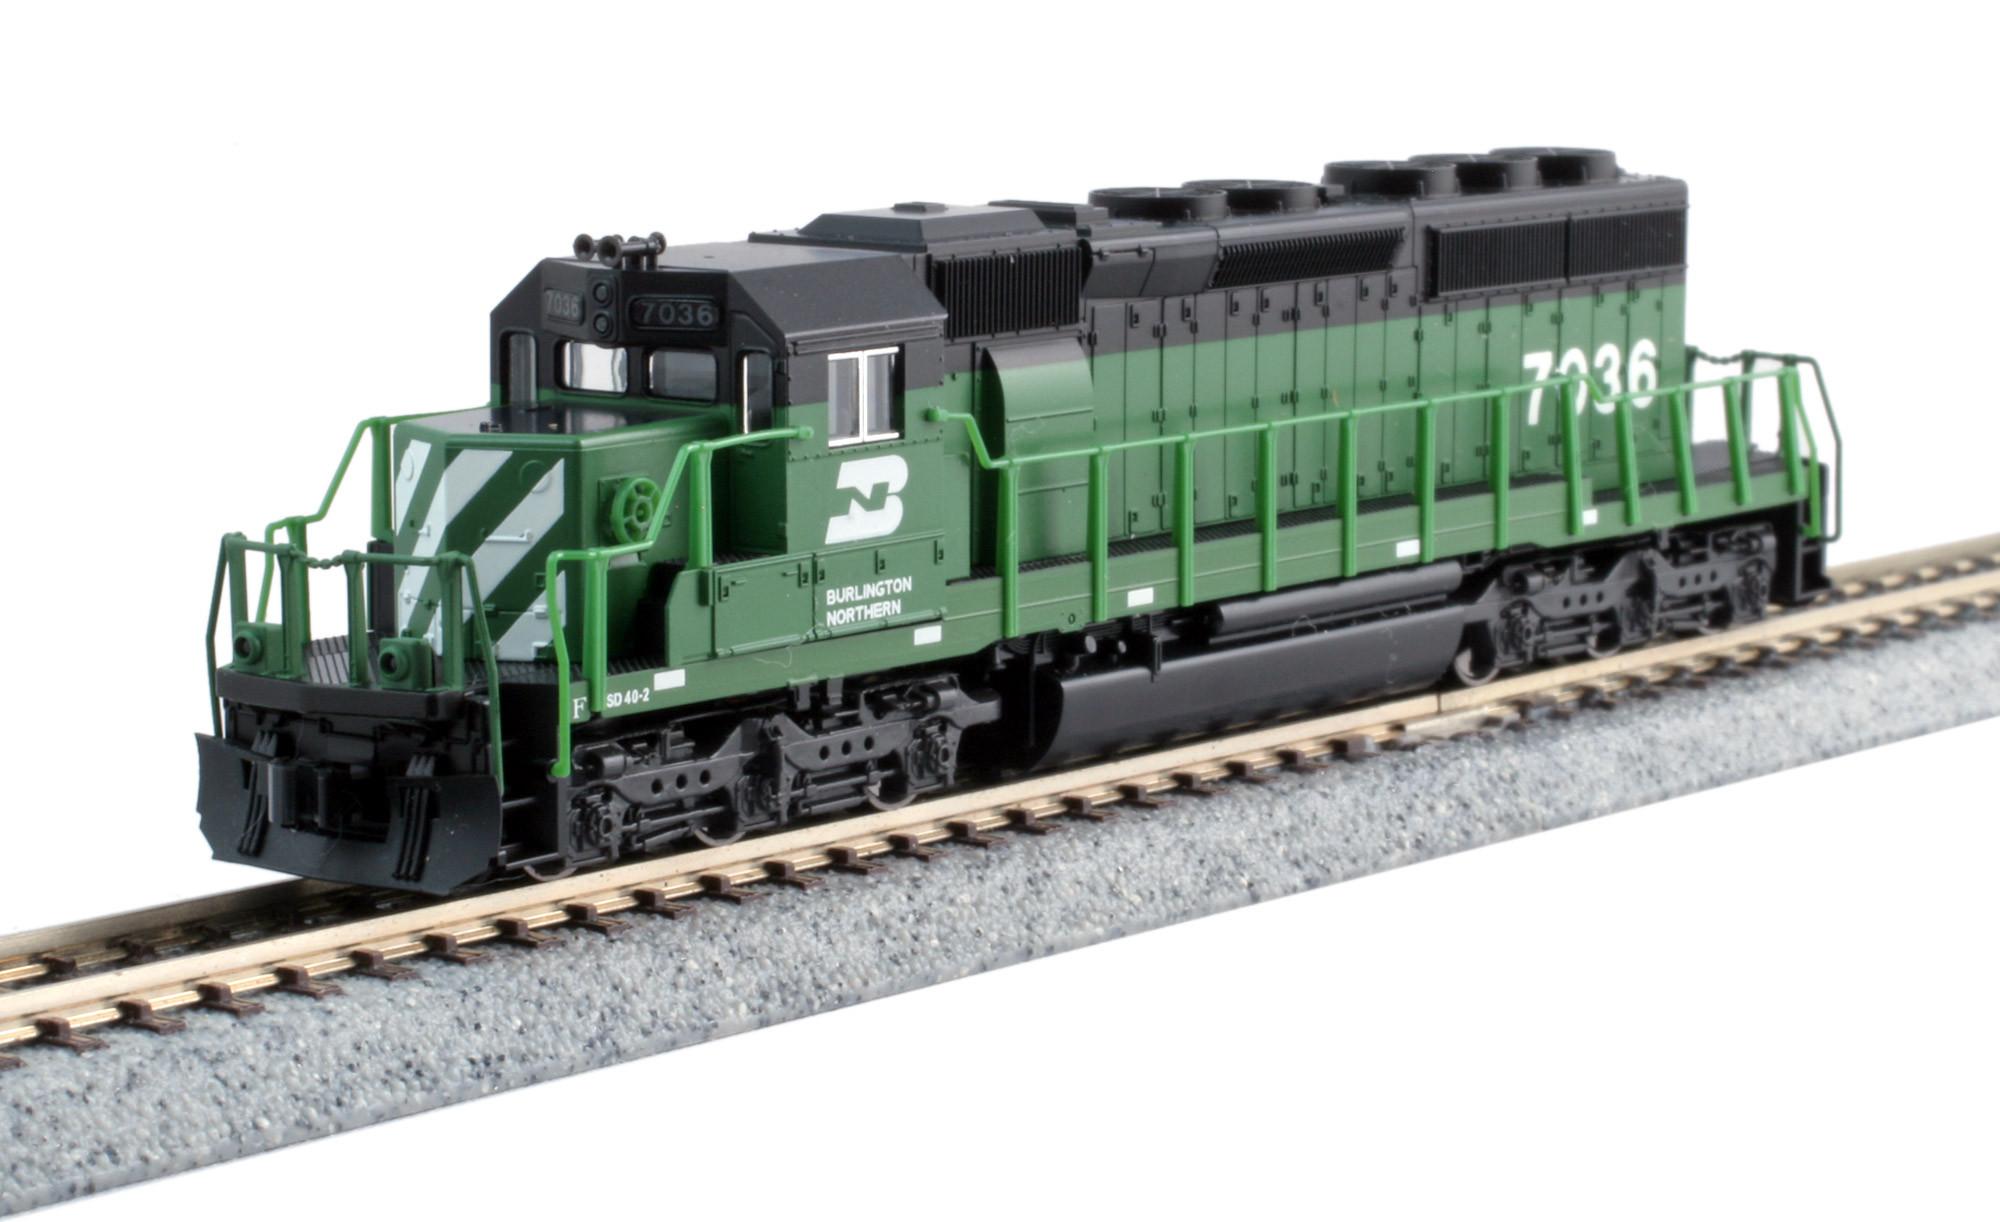 Kato N - Locomotiva SD40-2 BN #7036: 176-4961